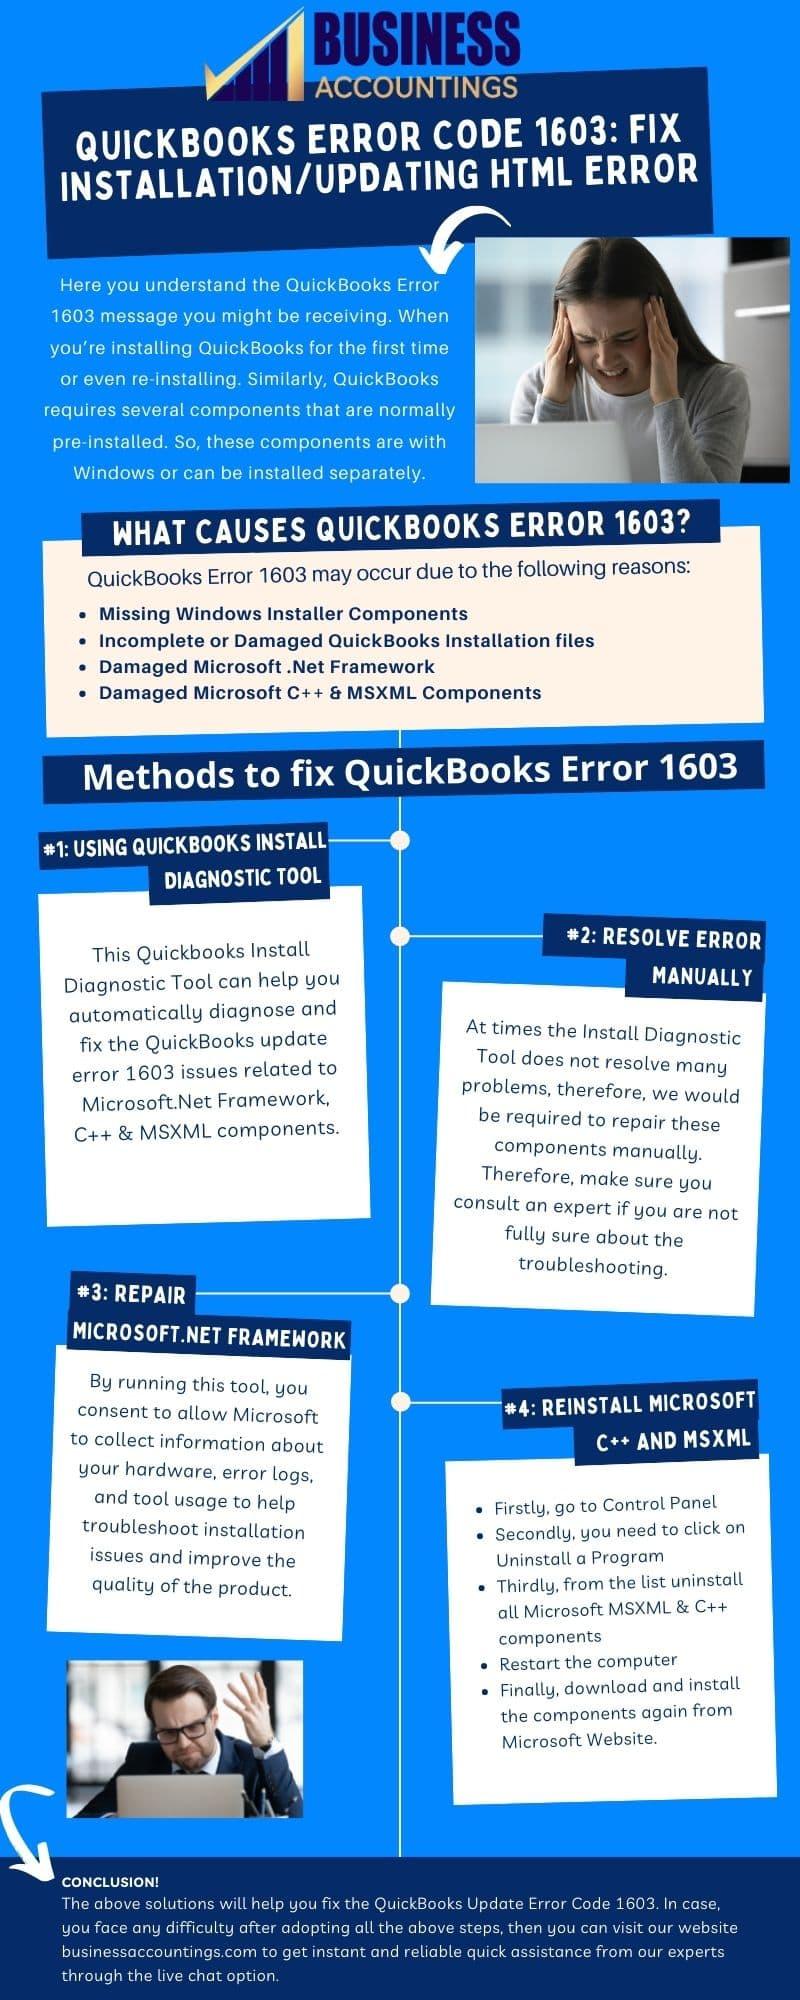 Infographic of Solutions to Quickbooks Error 1603